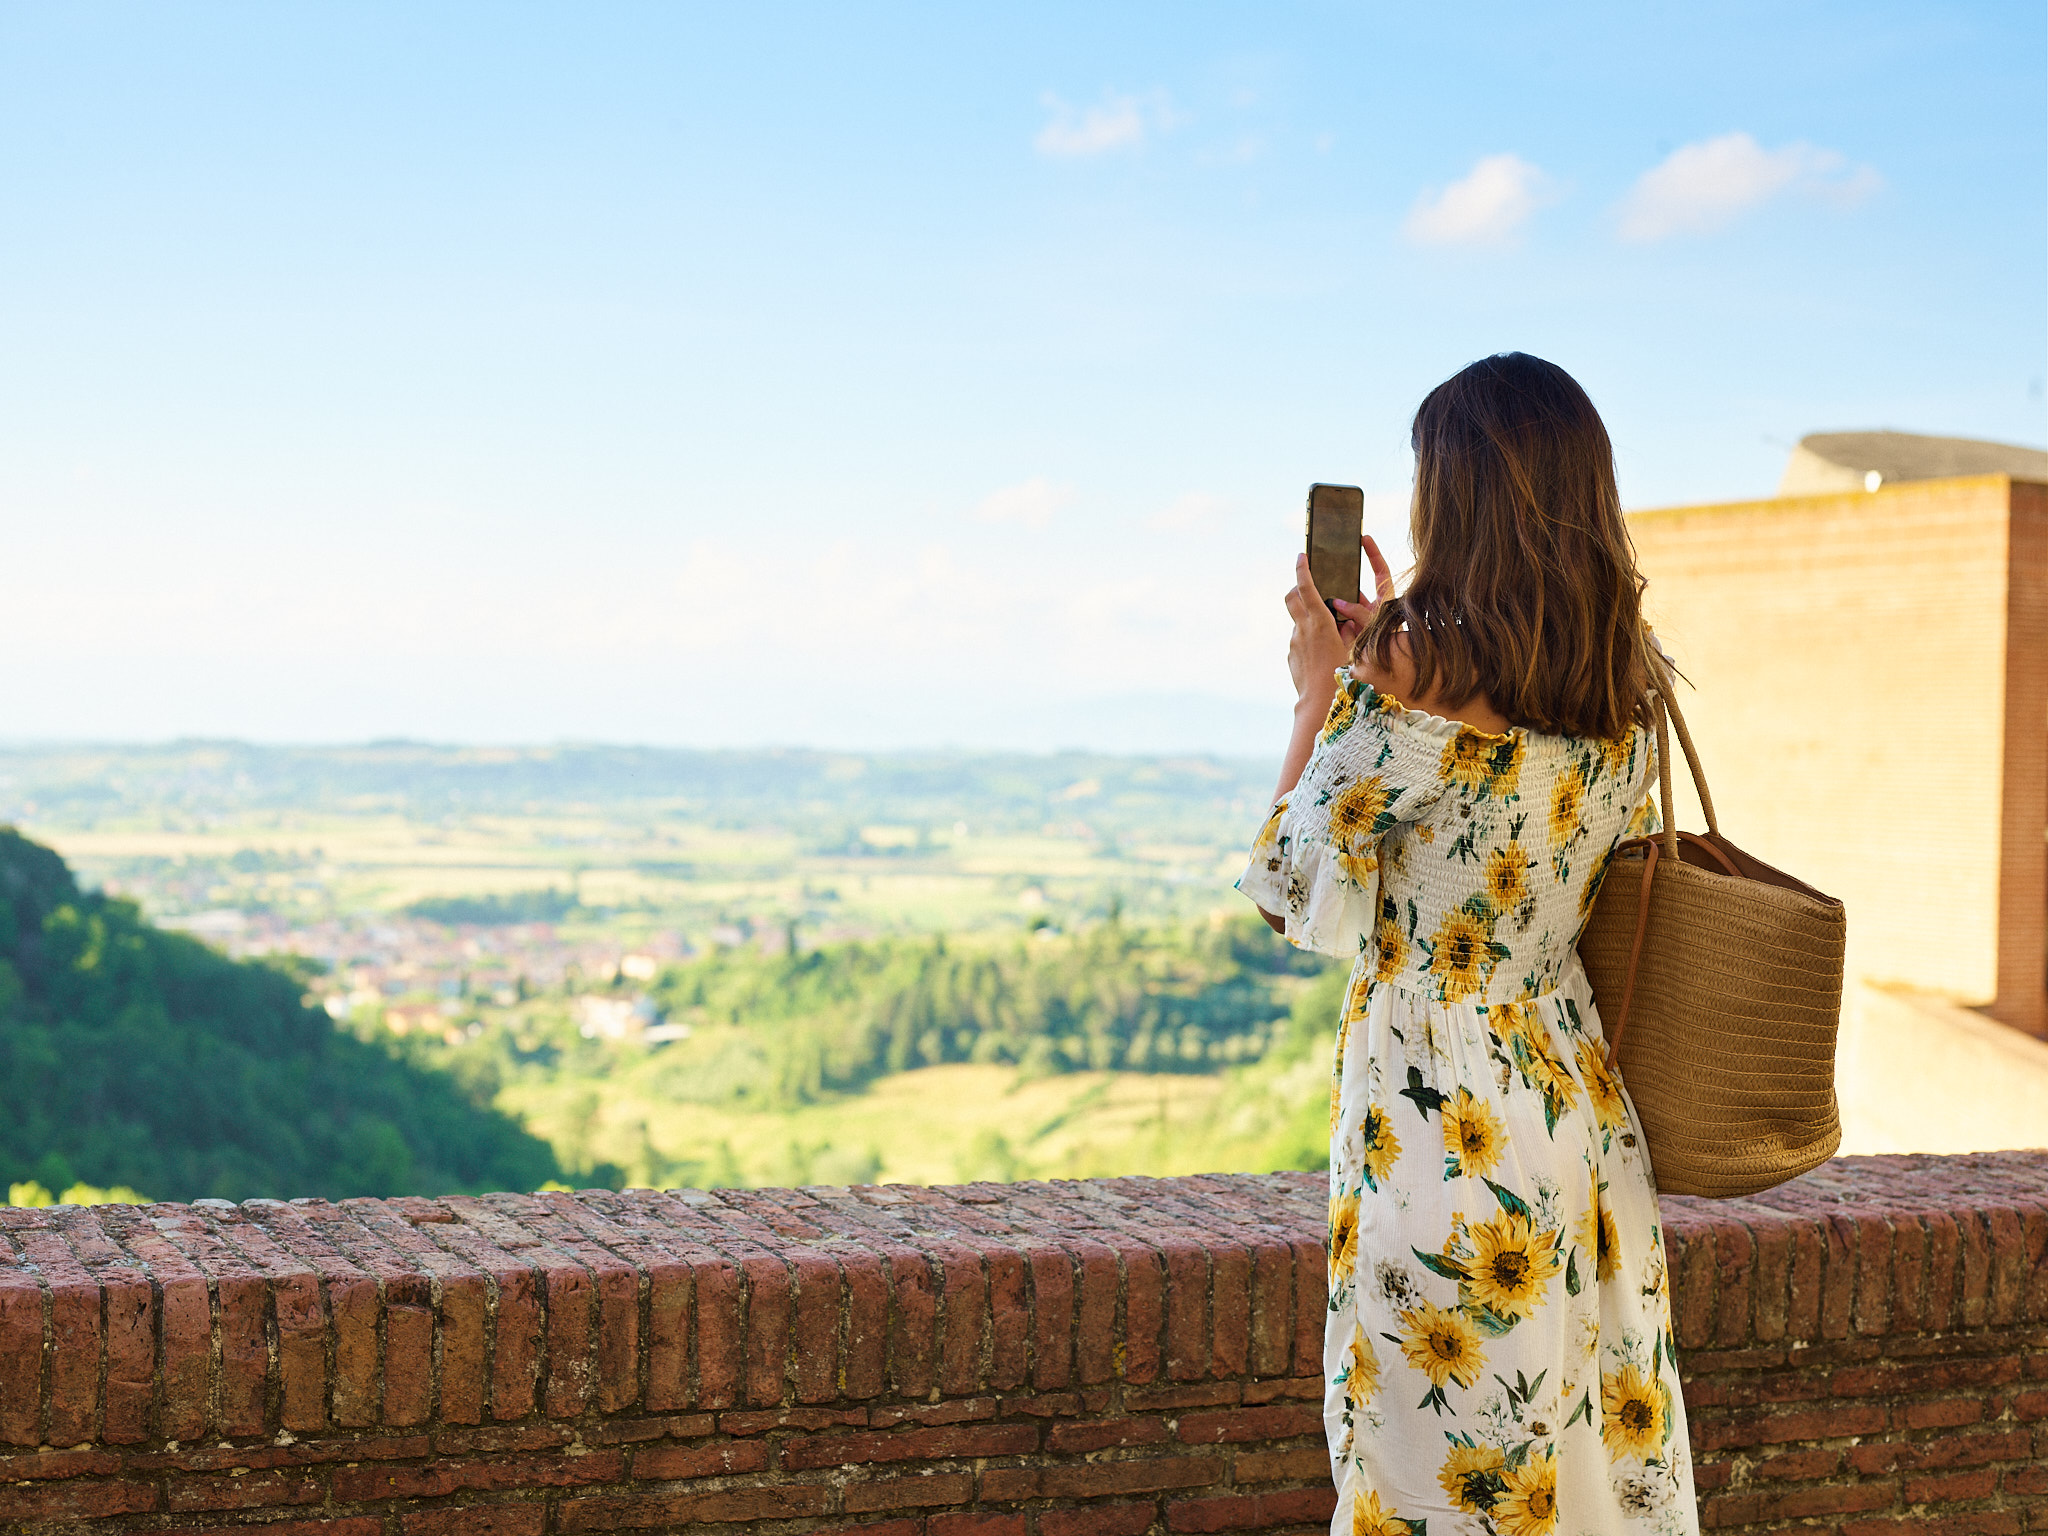 Deodoc-Toscana-Nicole-03.jpg